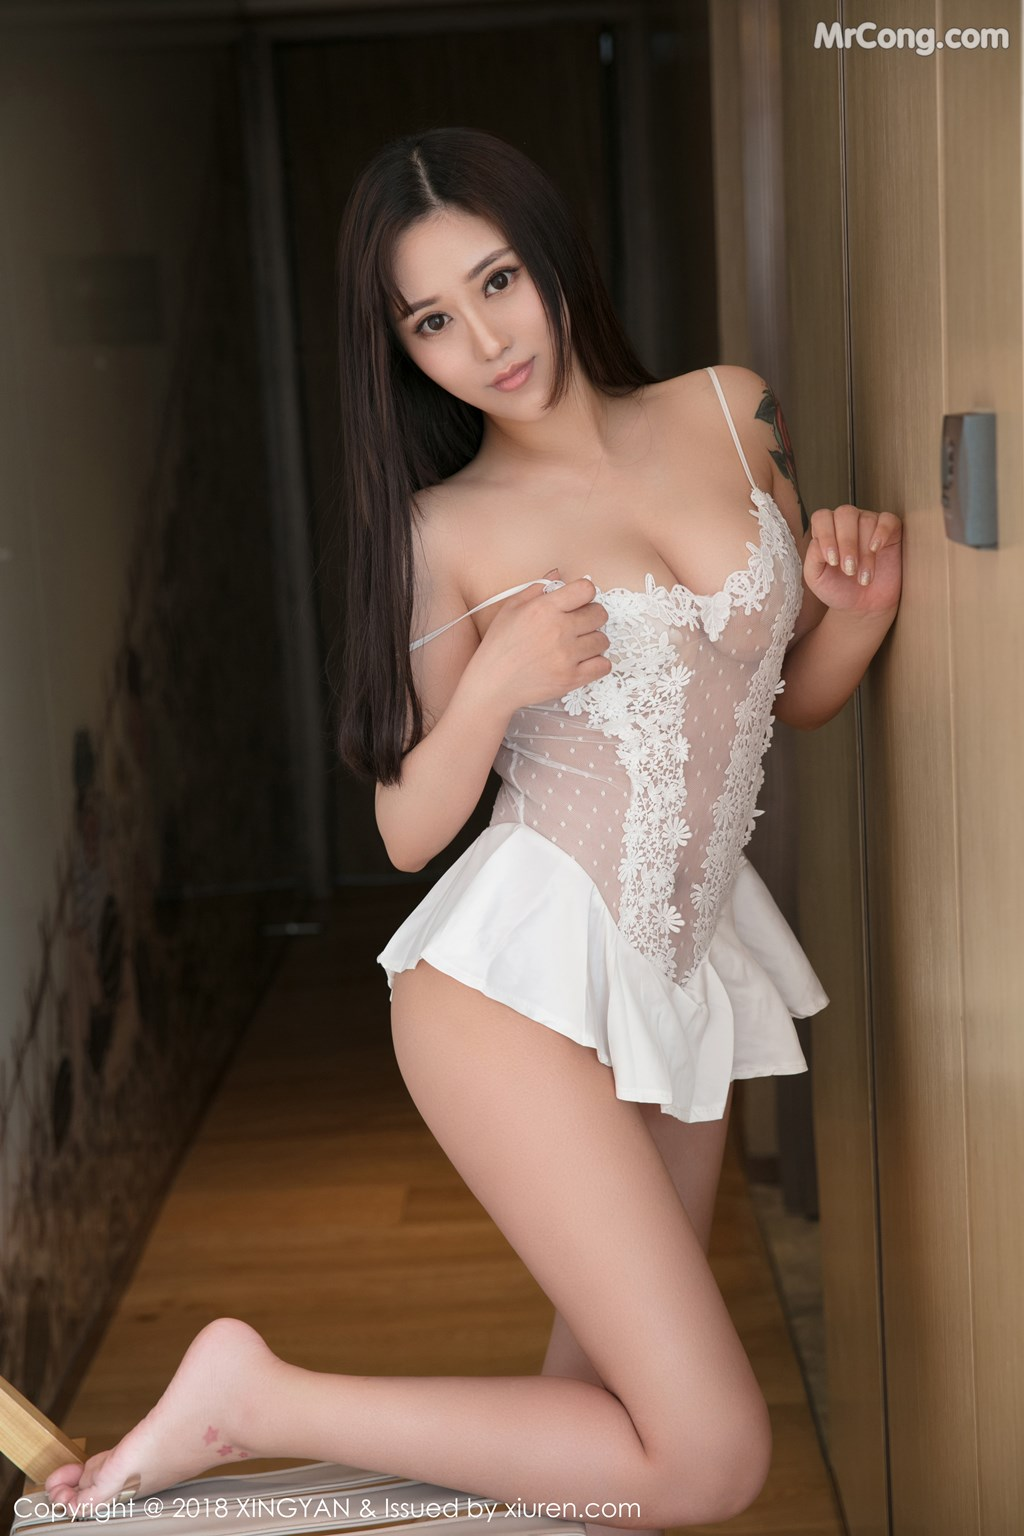 Image XingYan-Vol.043-Meng-Tian-MrCong.com-007 in post XingYan Vol.043: Người mẫu Meng Tian (梦甜) (41 ảnh)